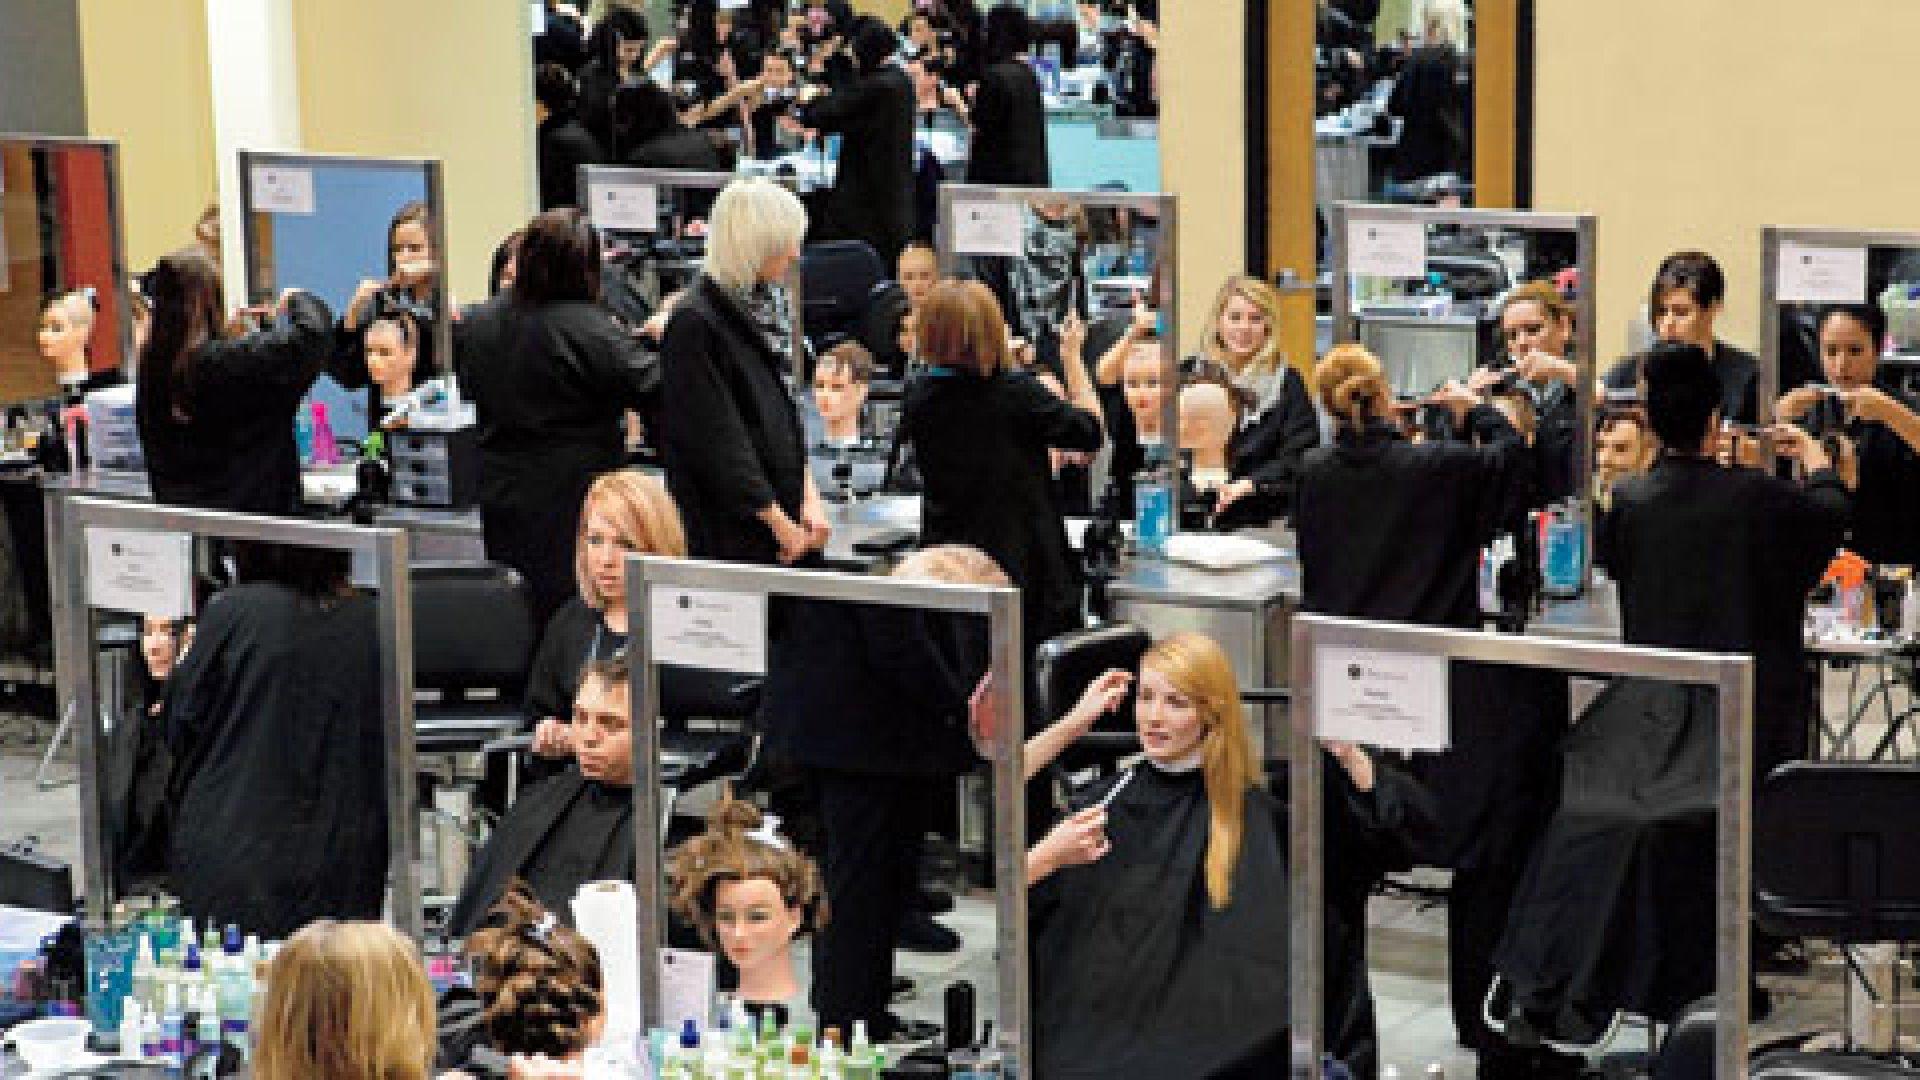 The Companies Behind Vici Beauty School